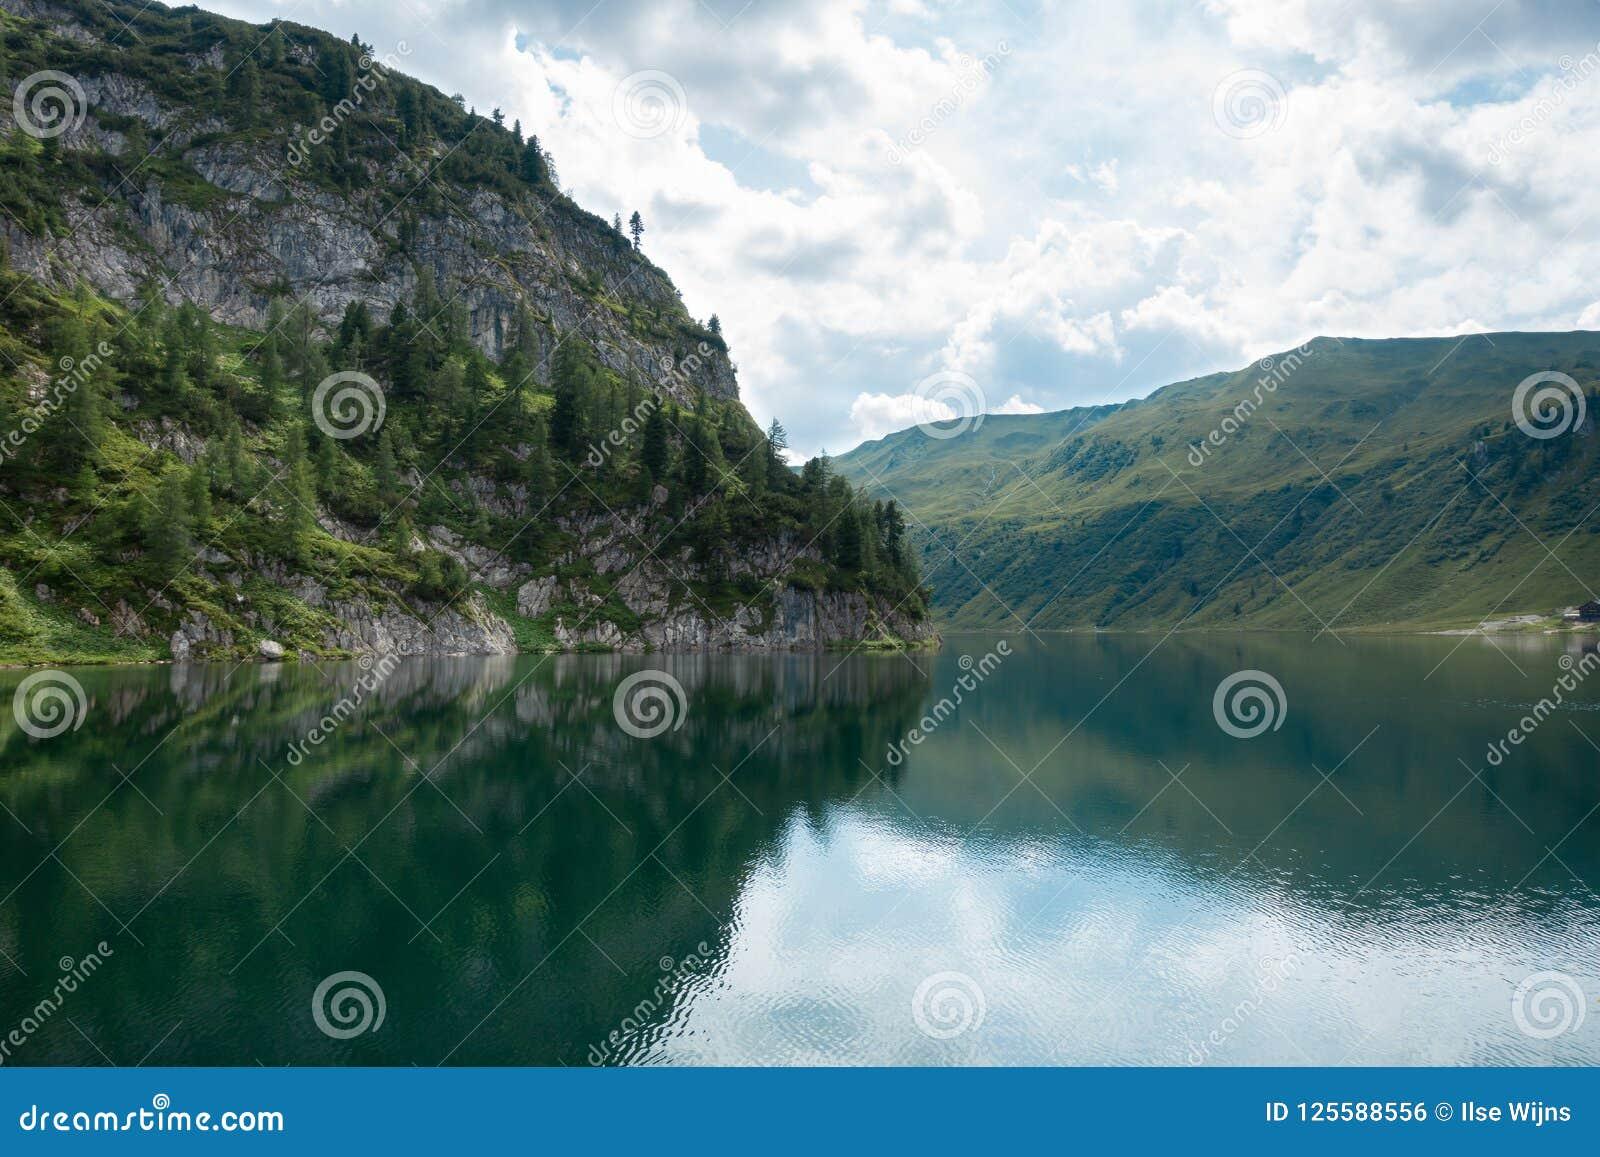 Waterscape through rocks, mountains and pine forest, Salzburg, Austria